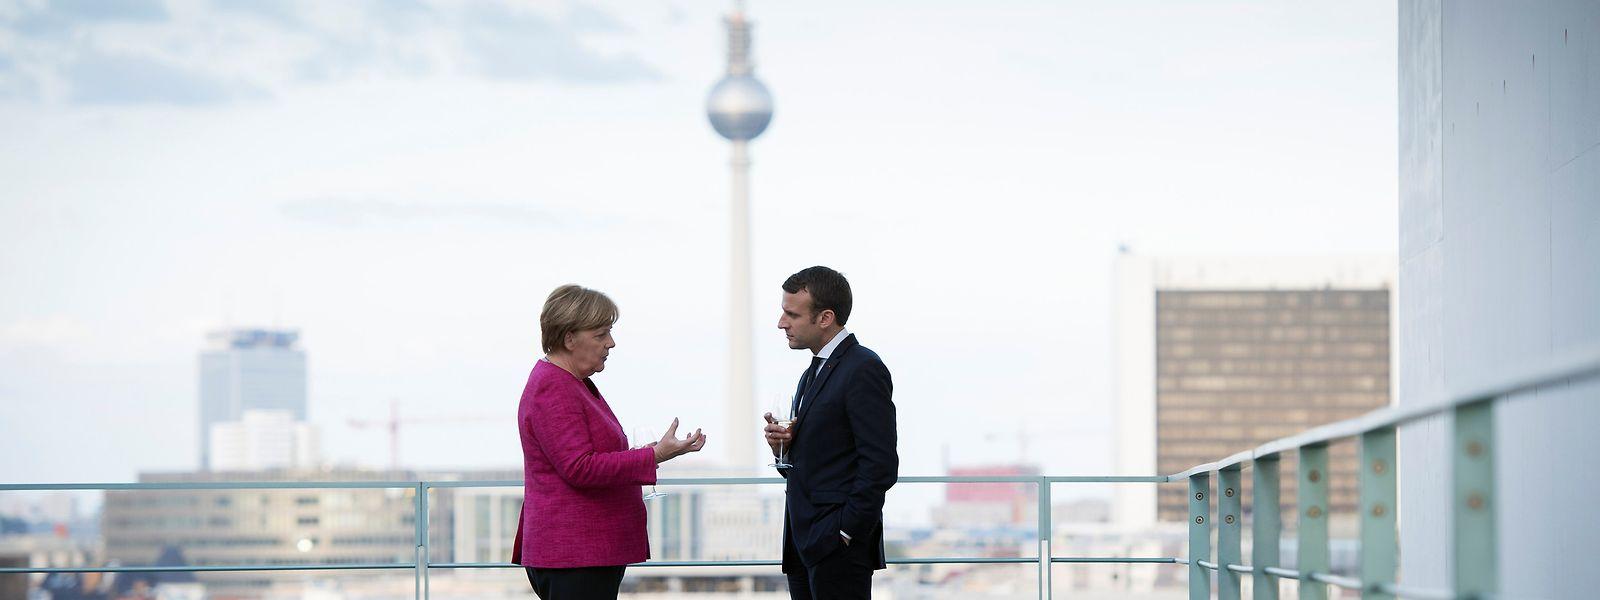 Angela Merkel und Emmanuel Macron vor Berliner Kulisse.